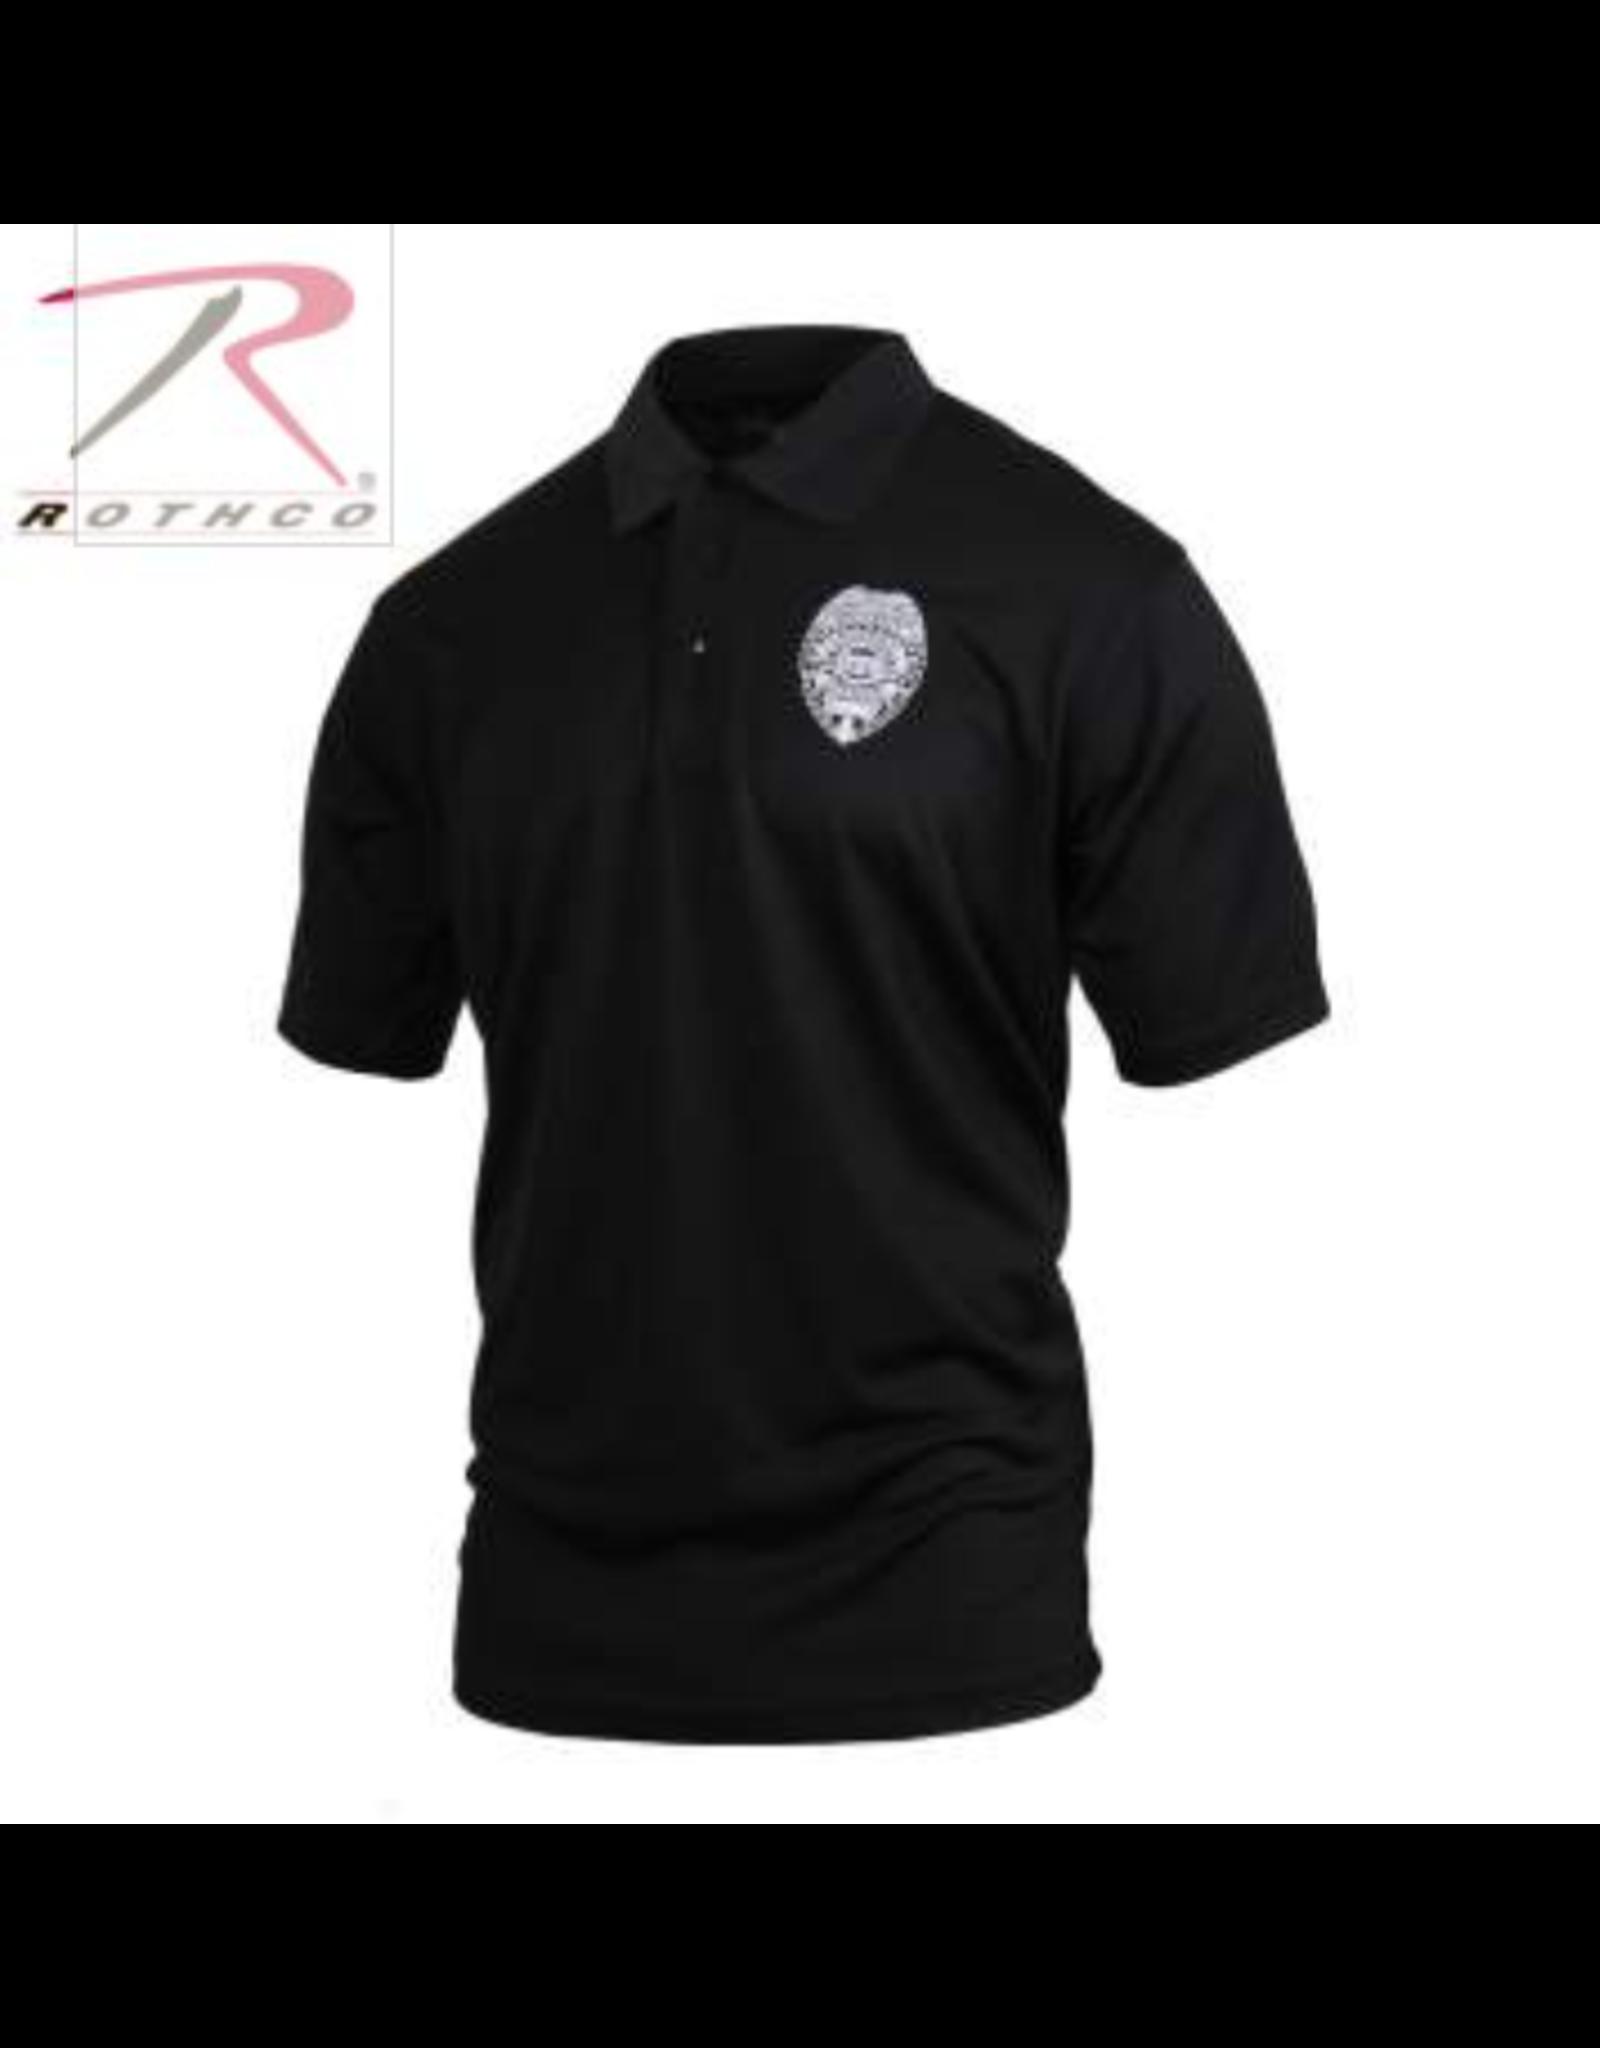 Rothco Rothco Security Badge Moisture Wicking Polo Shirt S